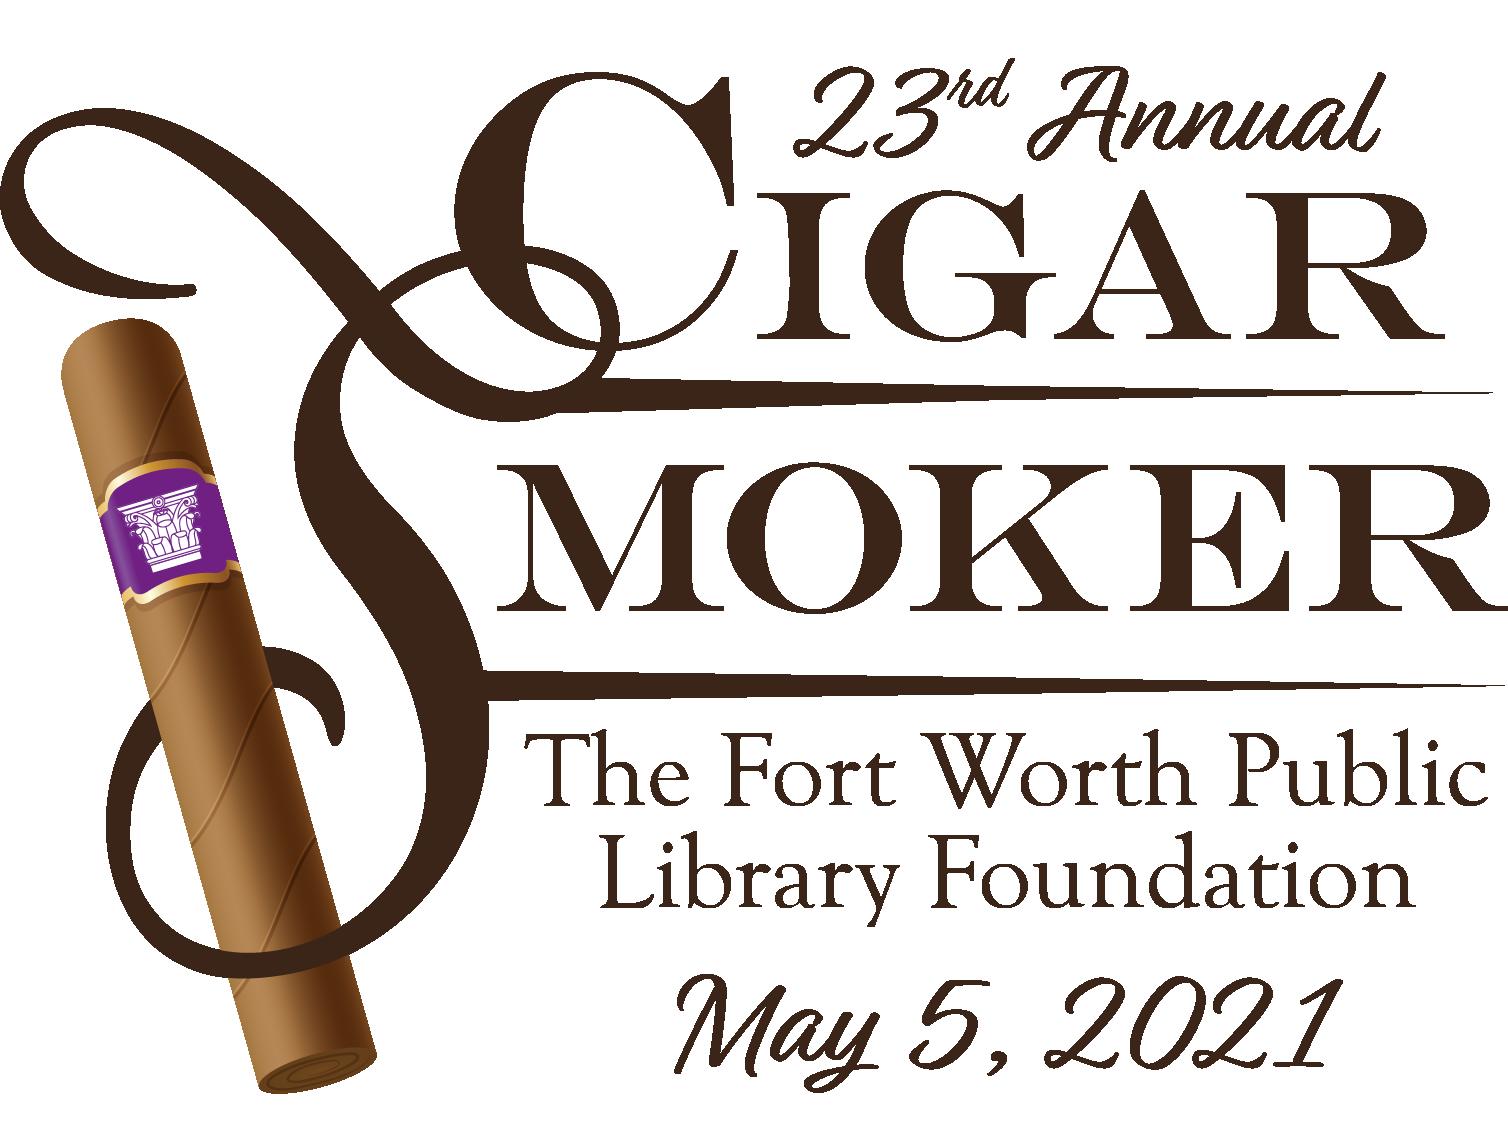 23rd Annual Cigar Smoker